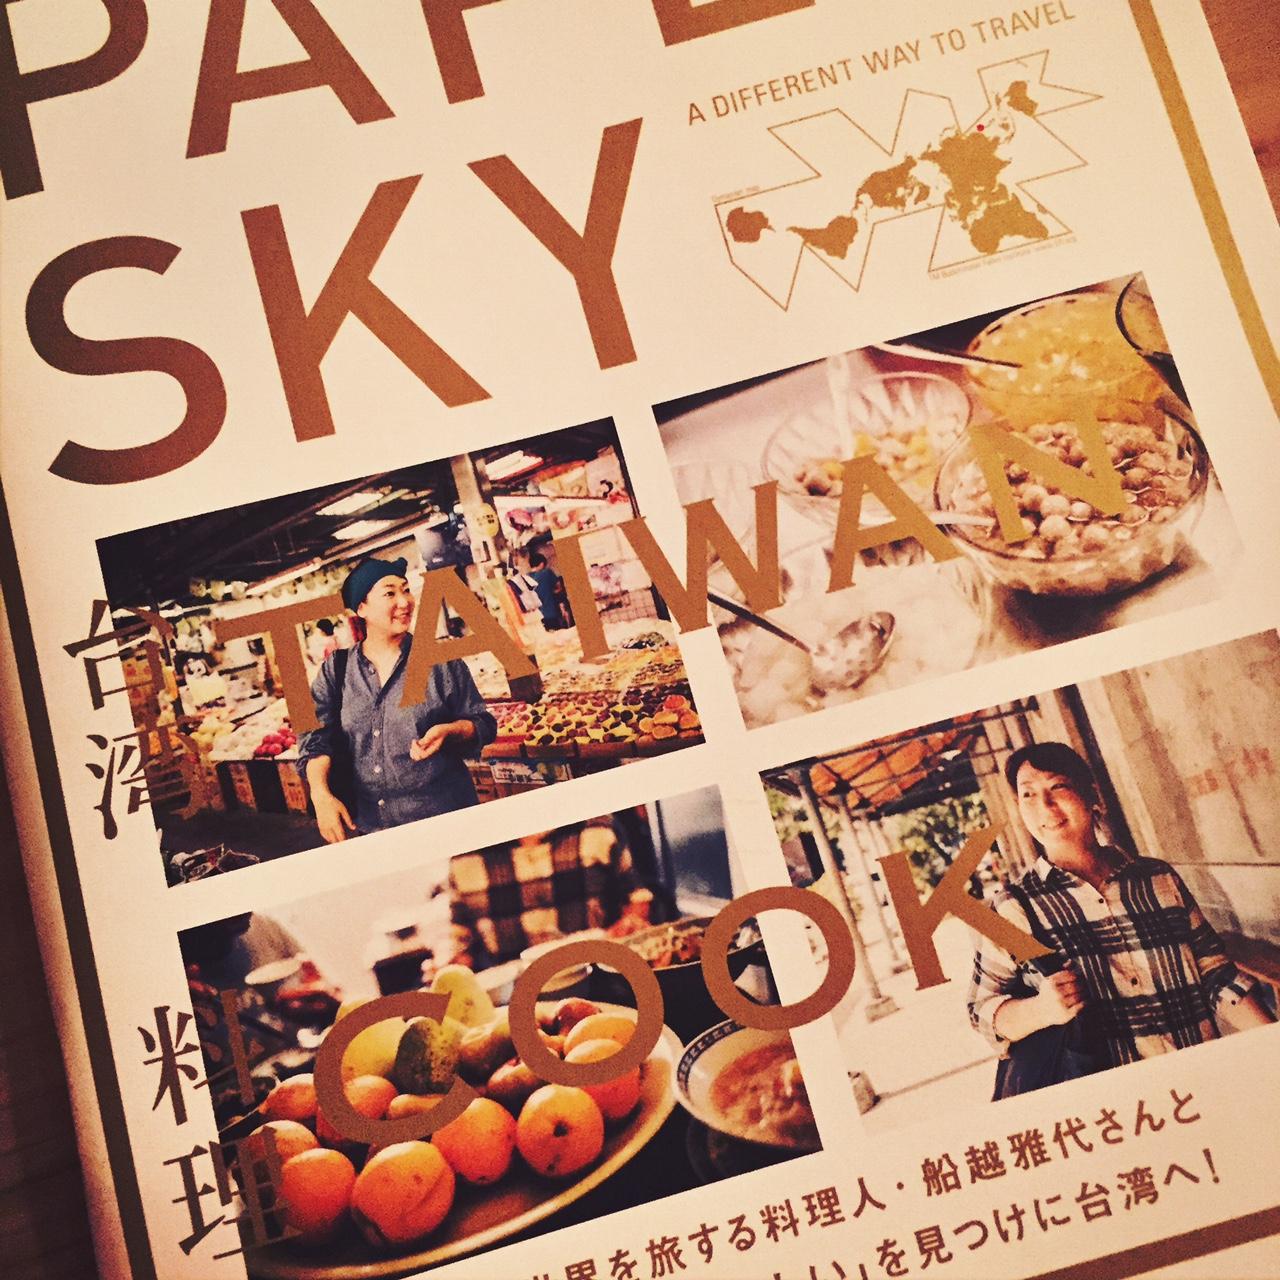 「Masayo Funakoshi presents TAIWAN 'HOJA' NIGHT」